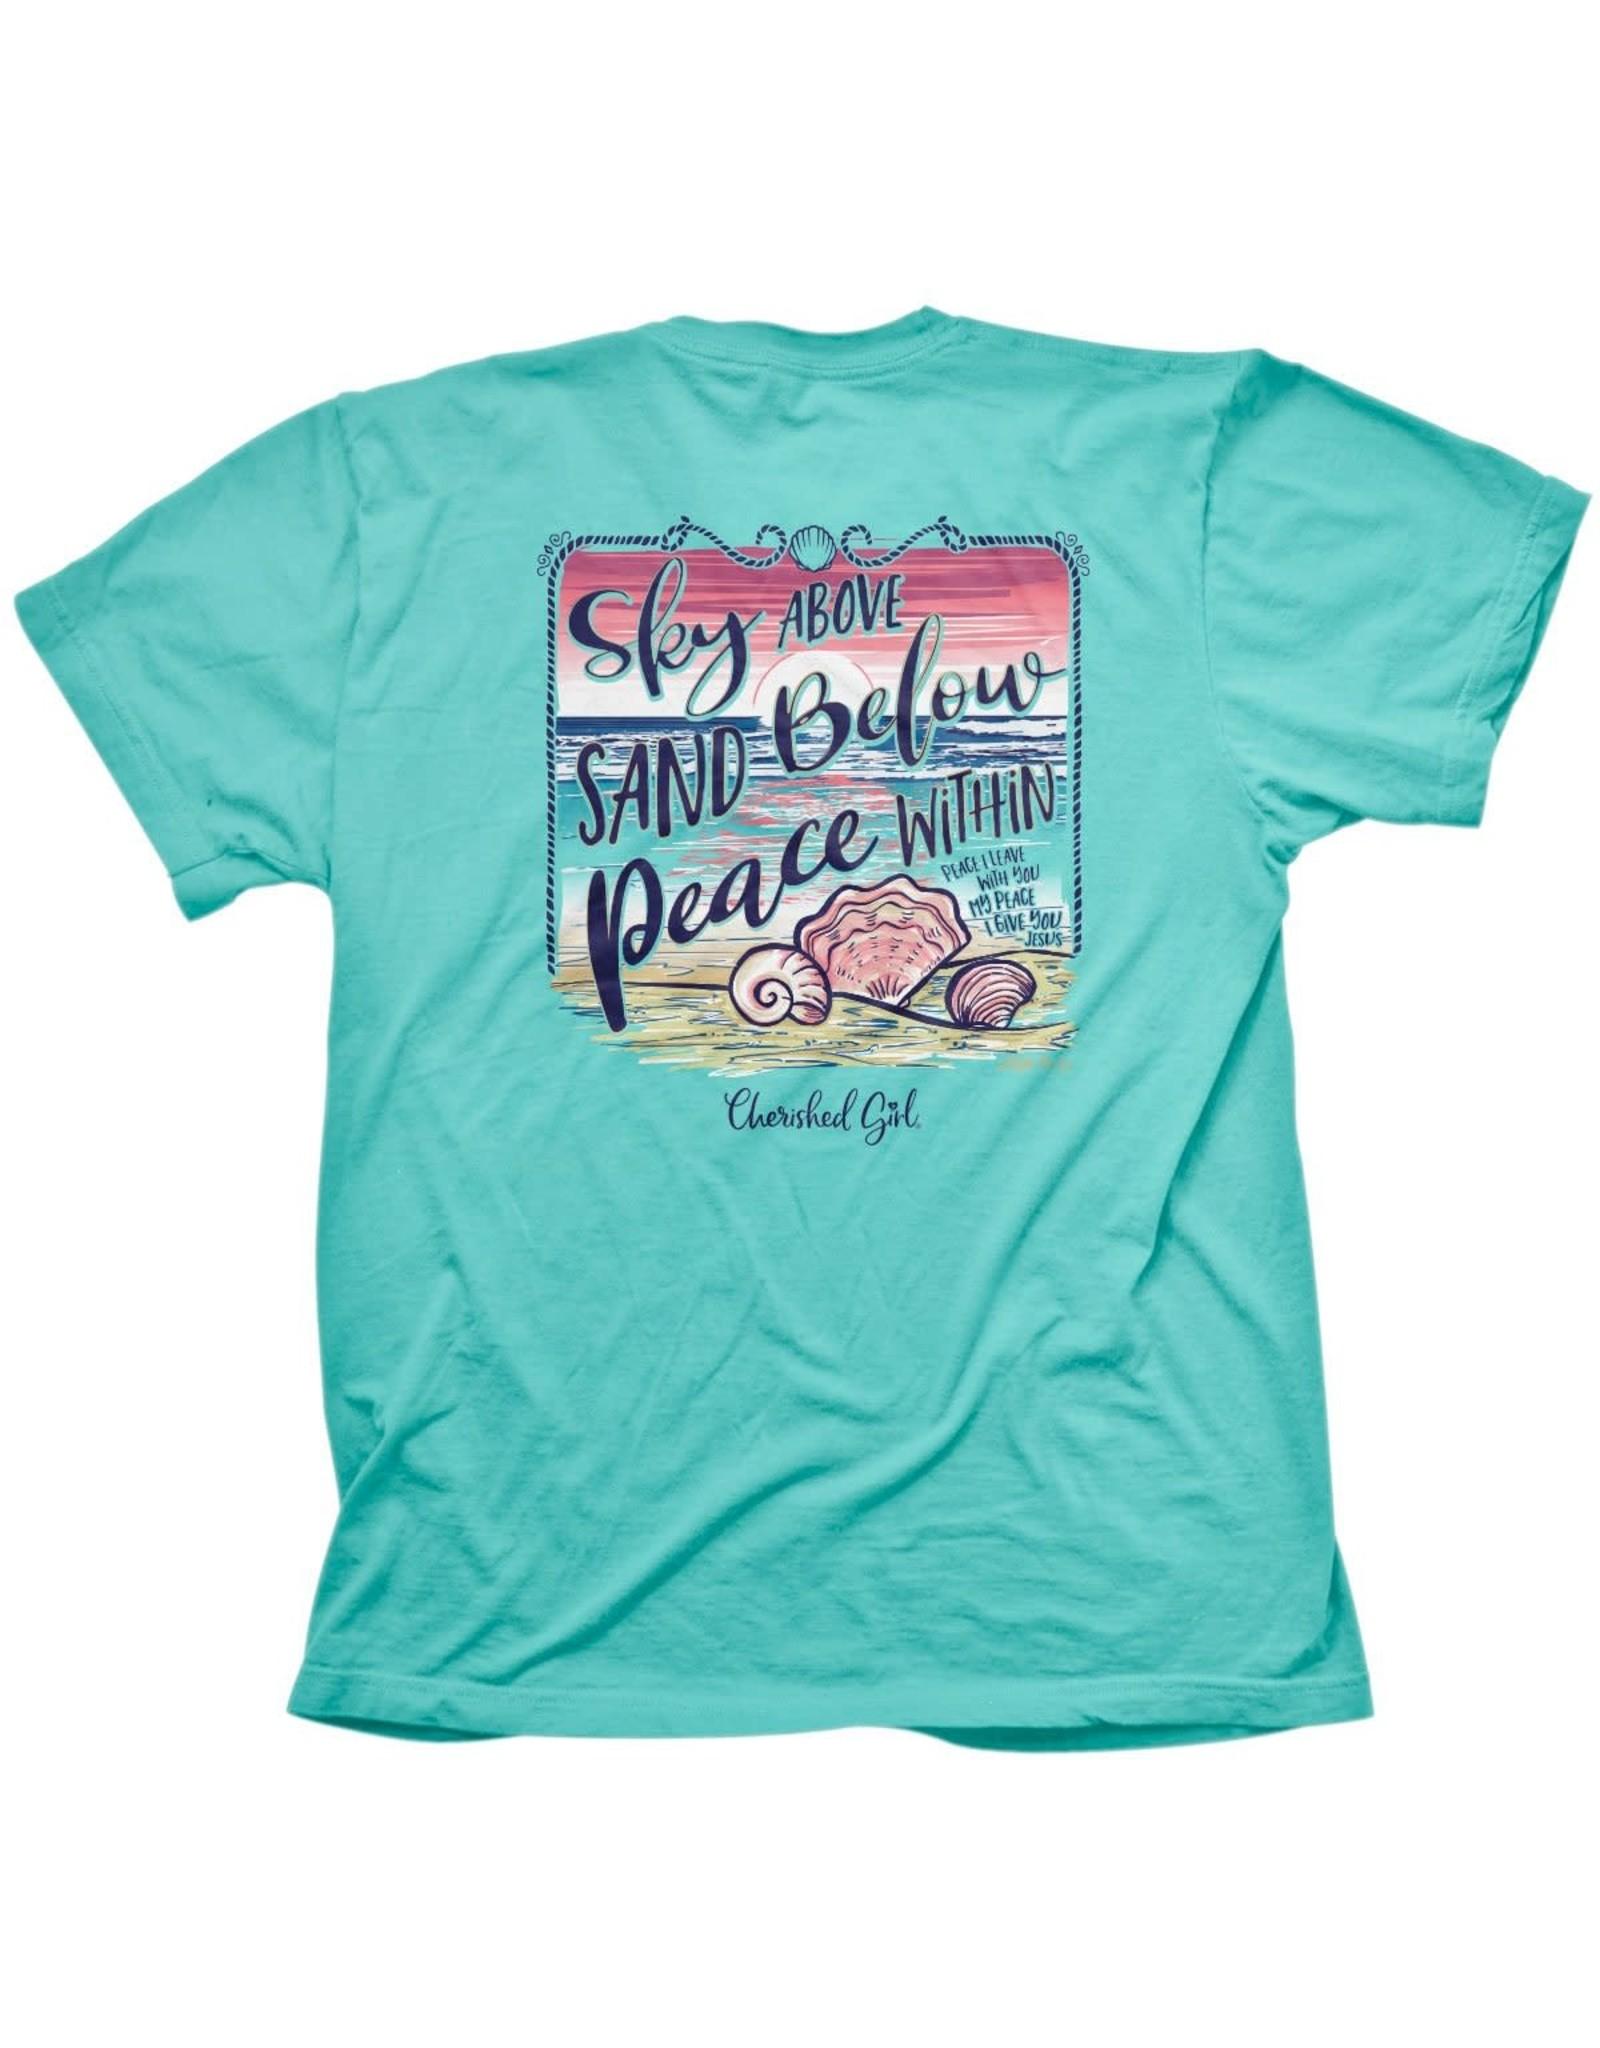 Adult Shirt - Sky Above